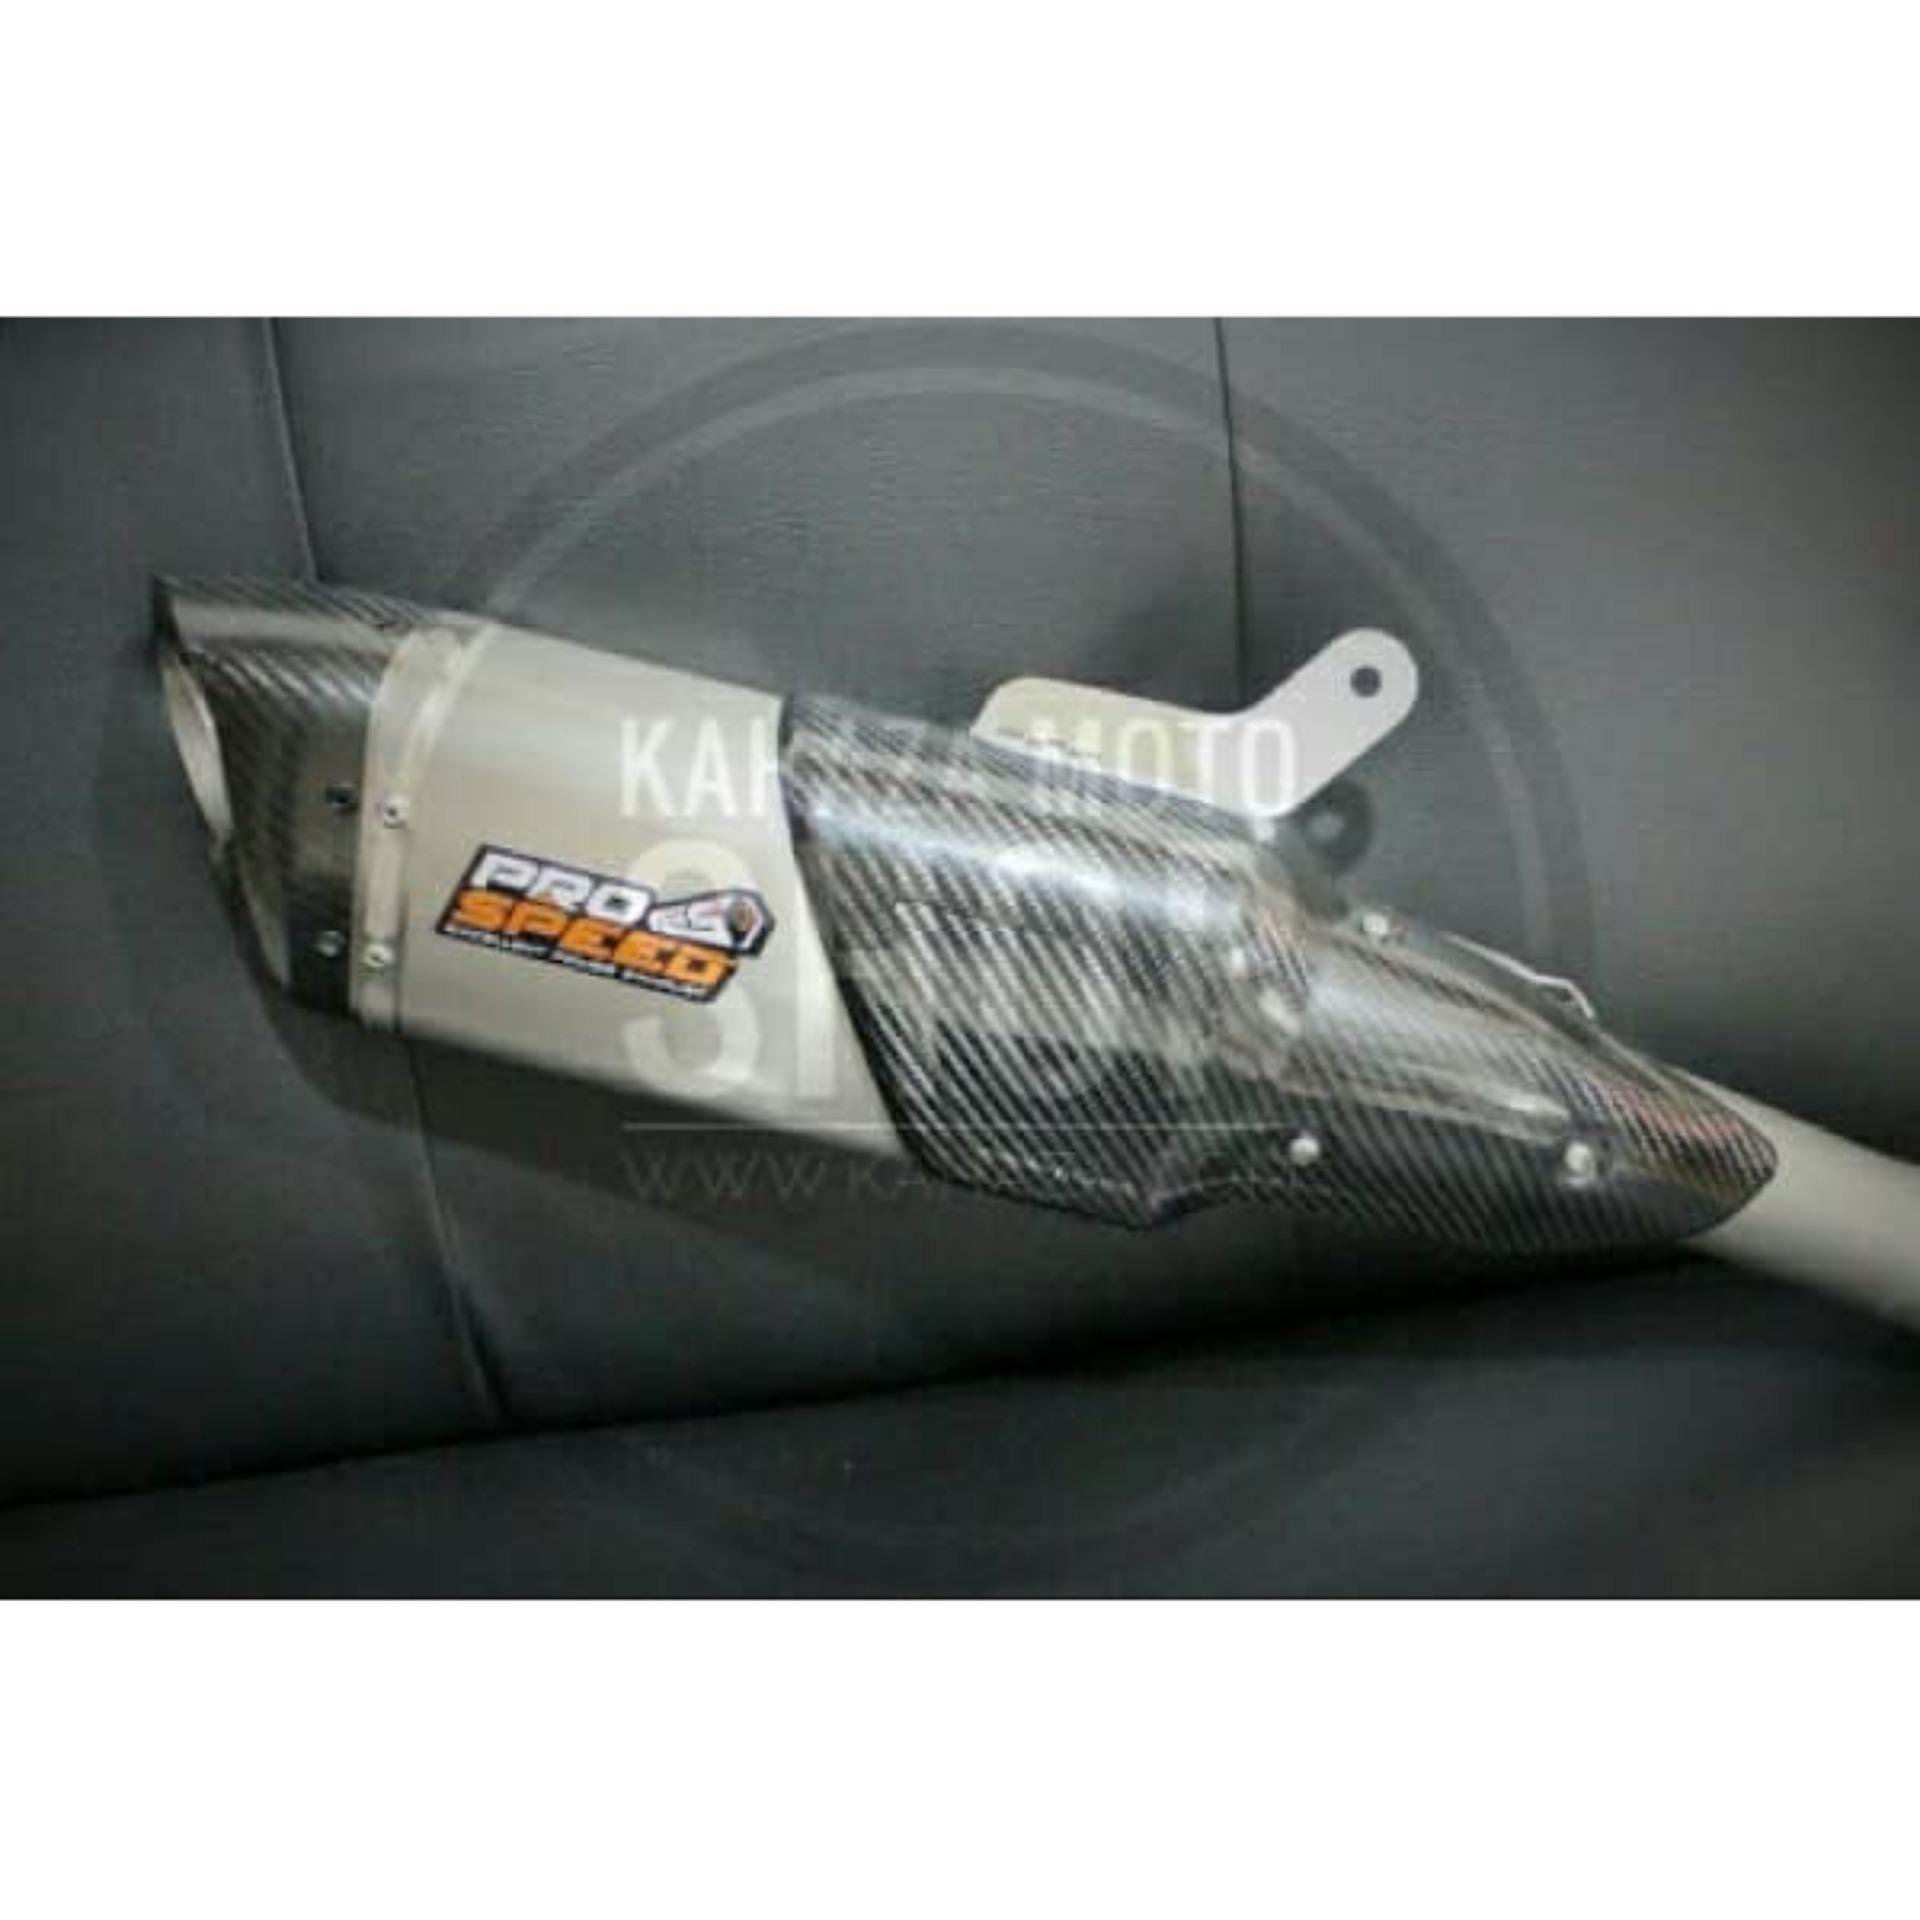 Penawaran Spesial Knalpot Prospeed Mf Black Yamaha R25 Mt25 Series Mt 25 Slip On Original Brand Viper Honda Cbr250rr Fullsystem Free Mide Pipe Guard